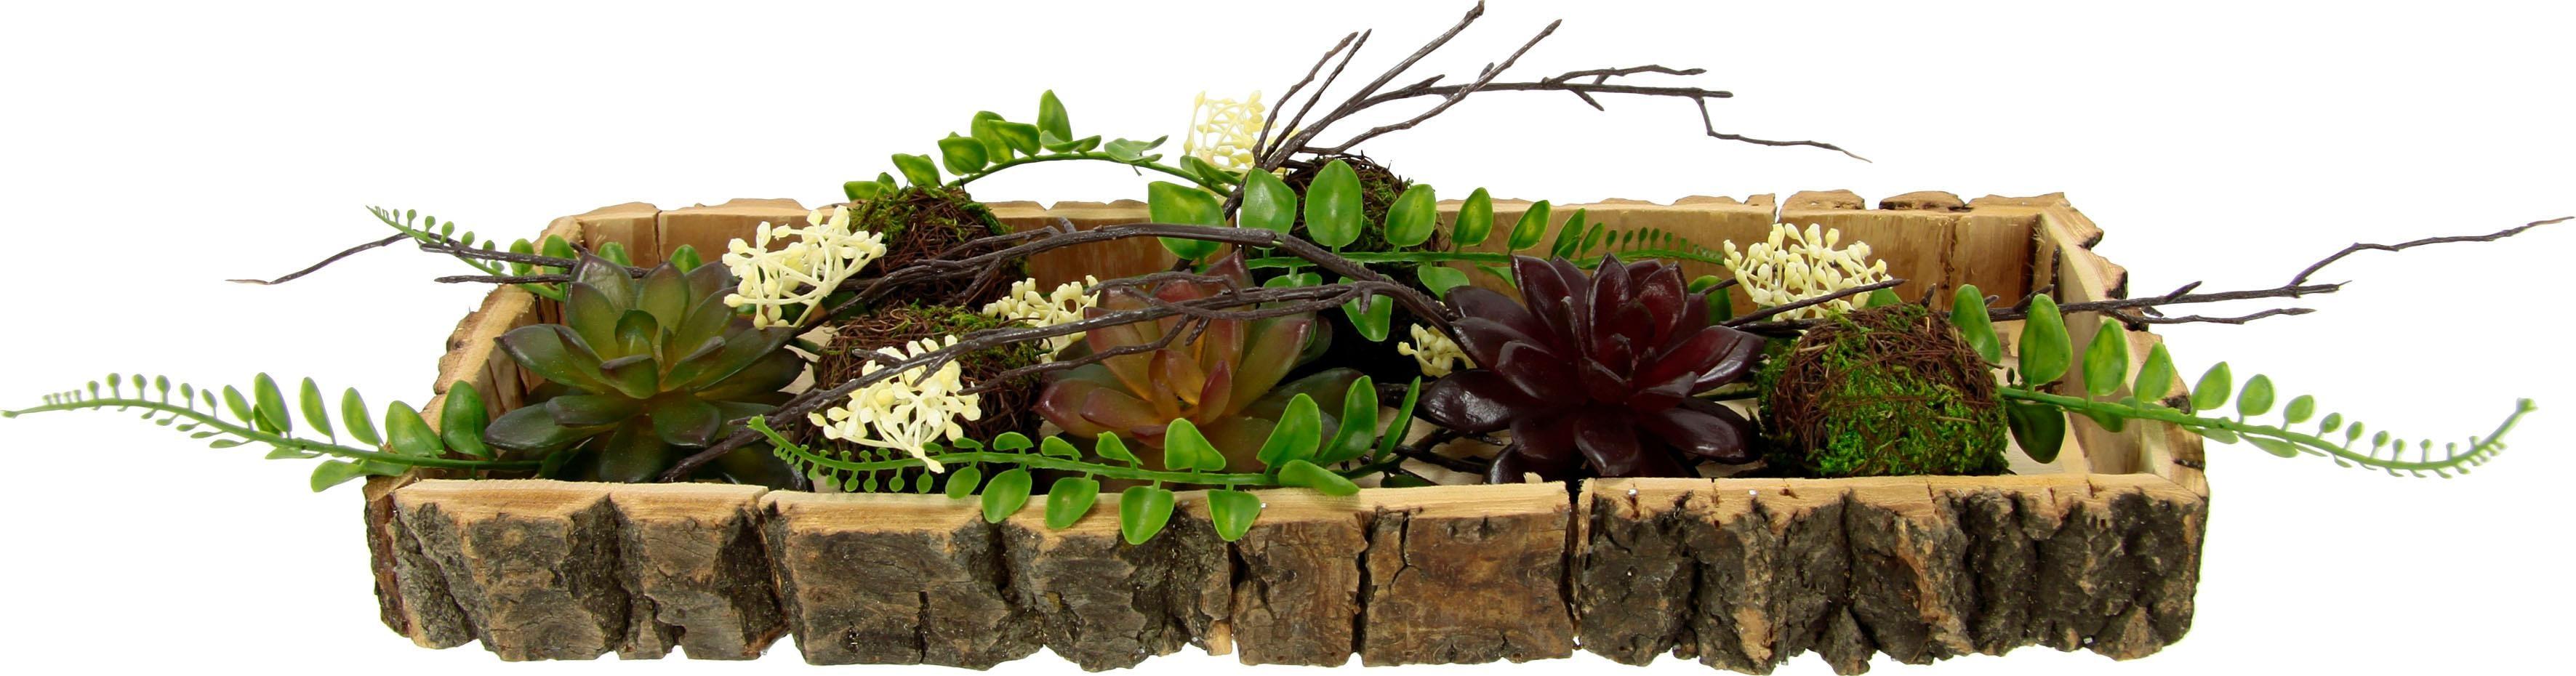 Home affaire Holztablett, Sukkulenten gross | Dekoration > Dekopflanzen > Pflanzen | Grün | home affaire